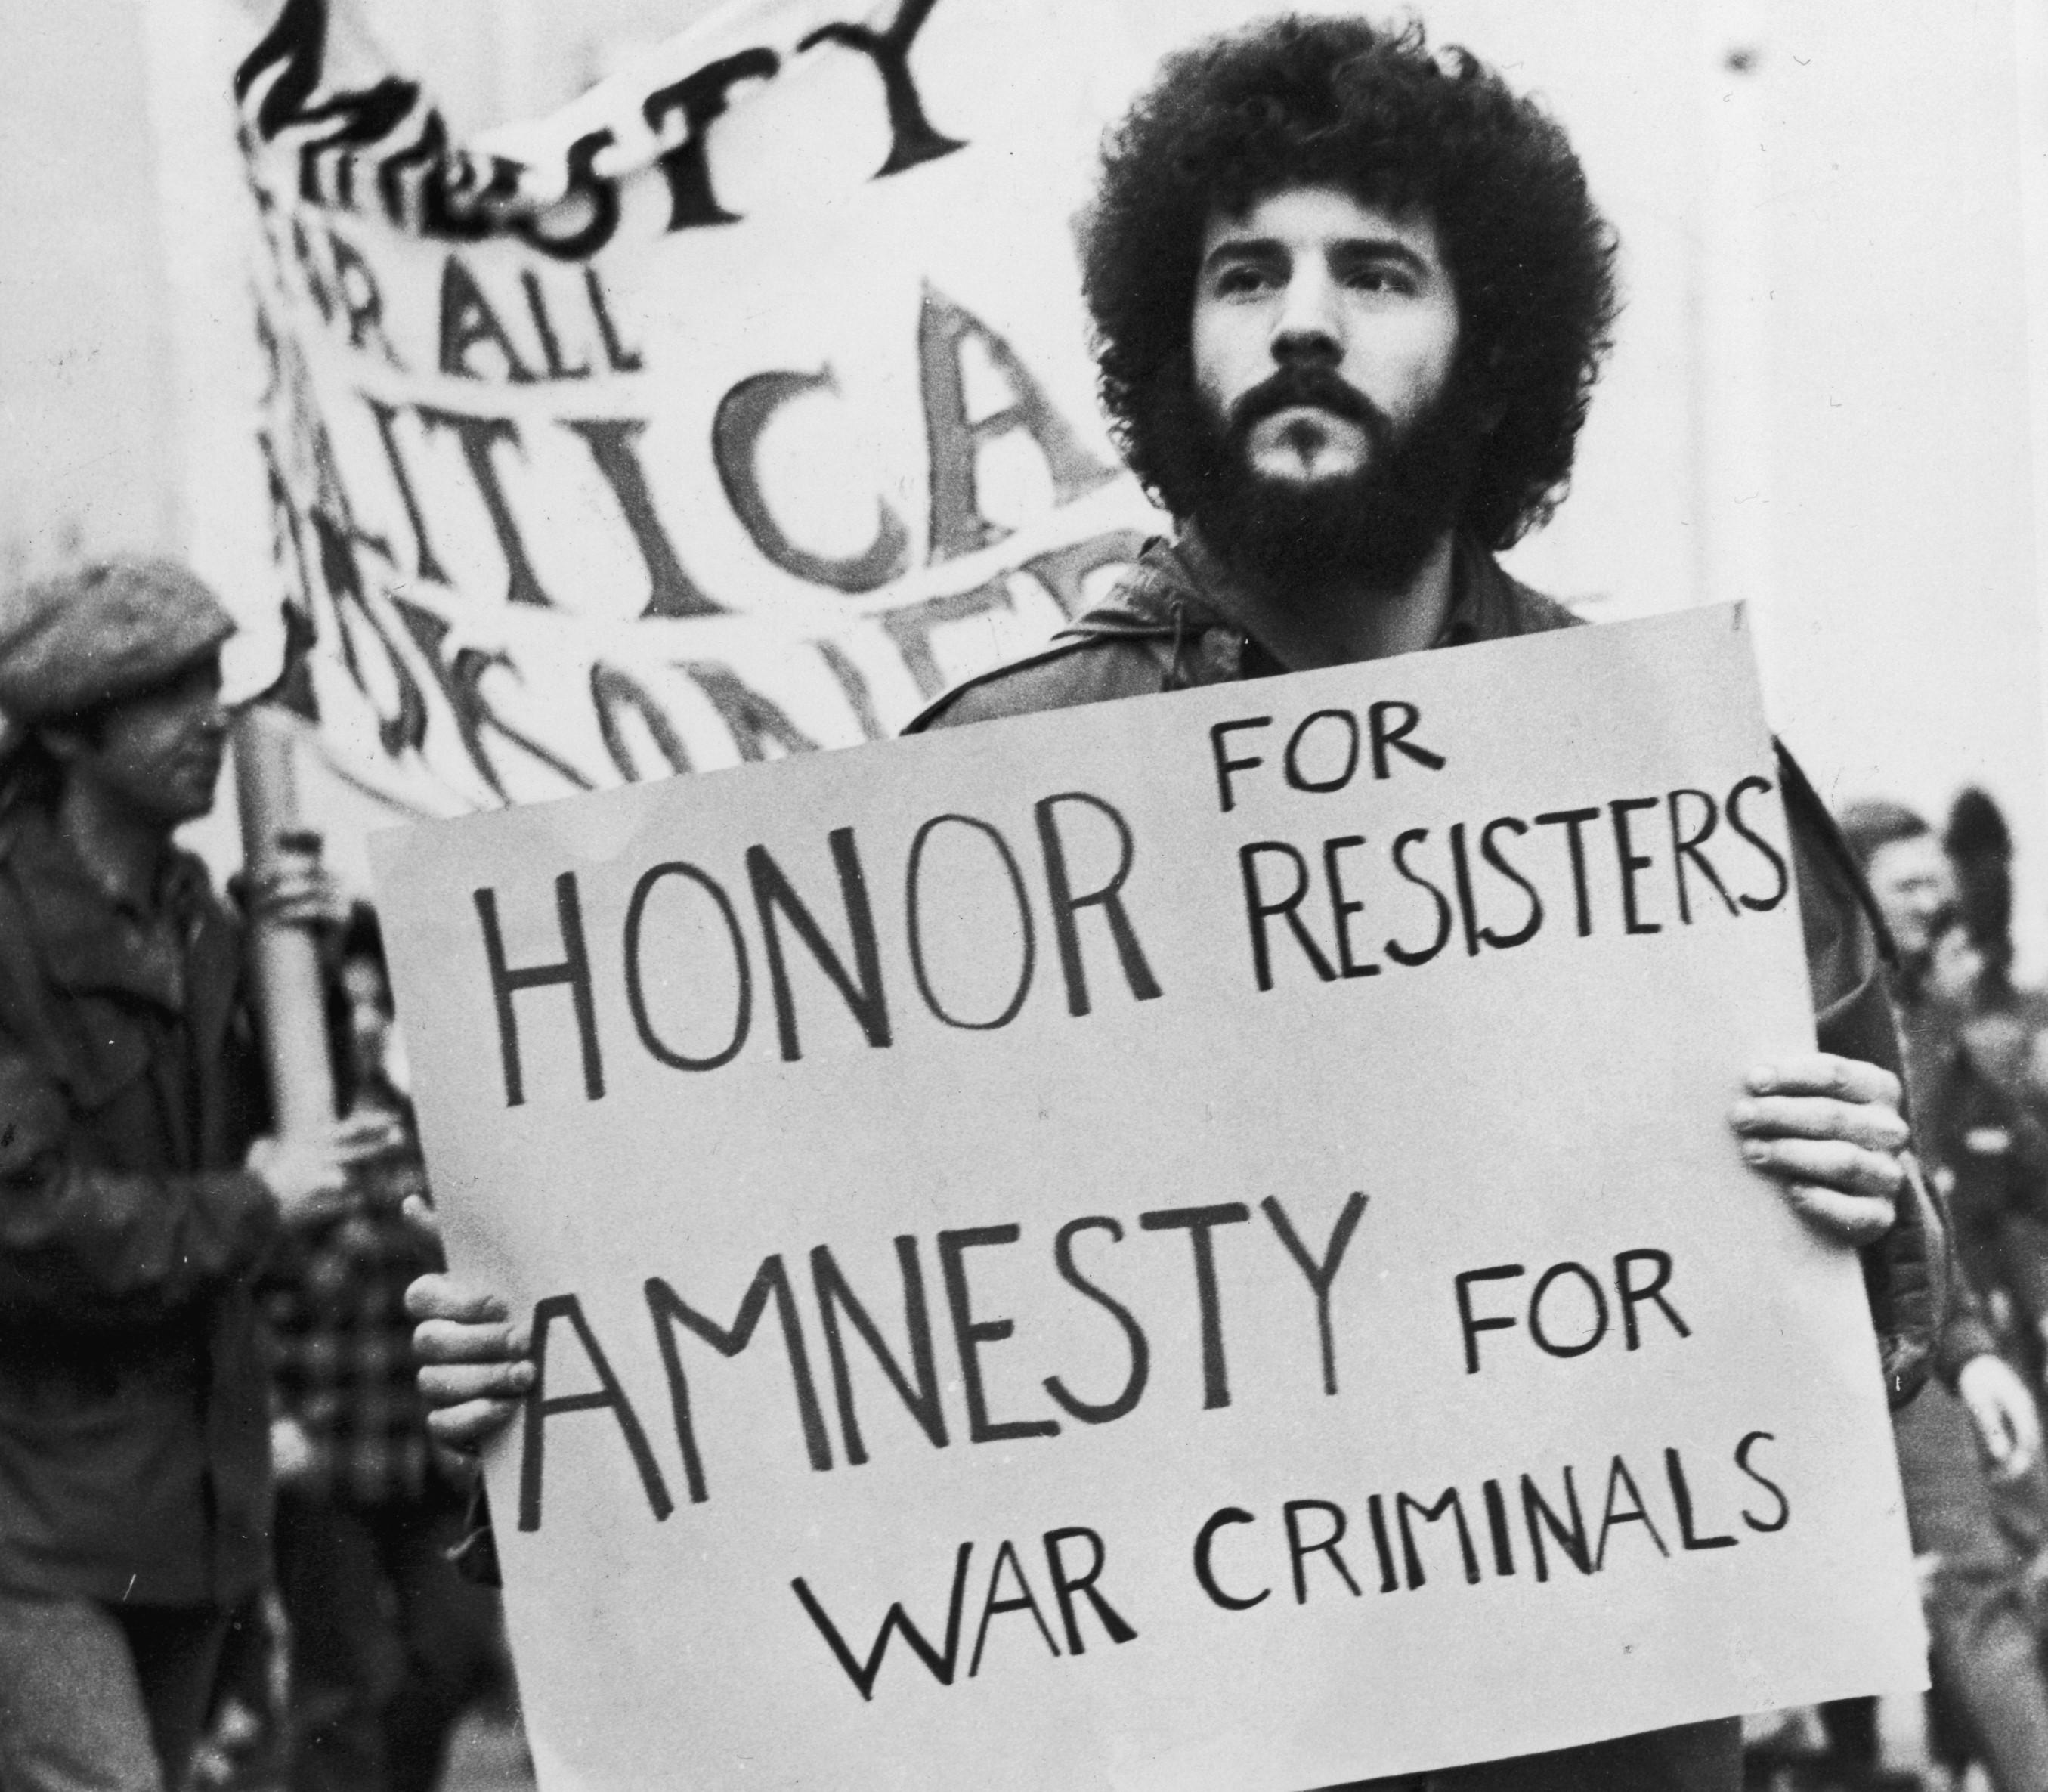 Vietnam War amnesty for draft dodgers